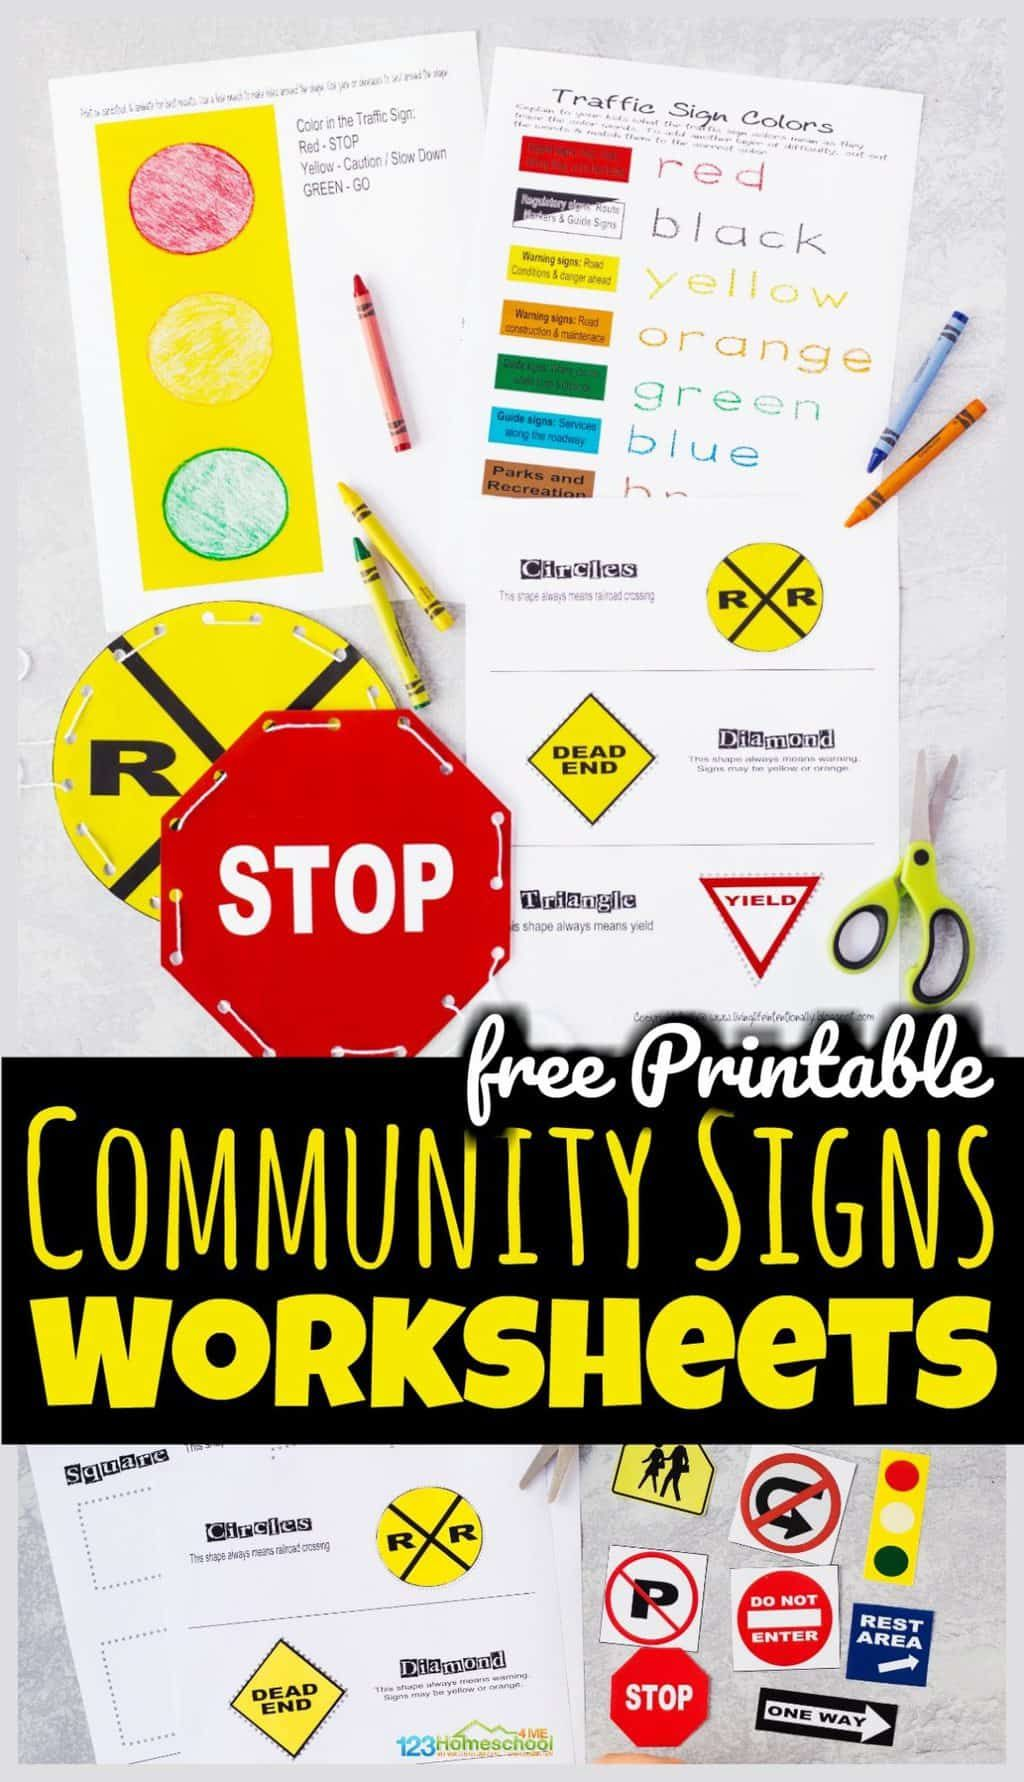 Free Printable Community Signs Worksheets Kindergarten Worksheets Community Signs Kindergarten Worksheets Printable